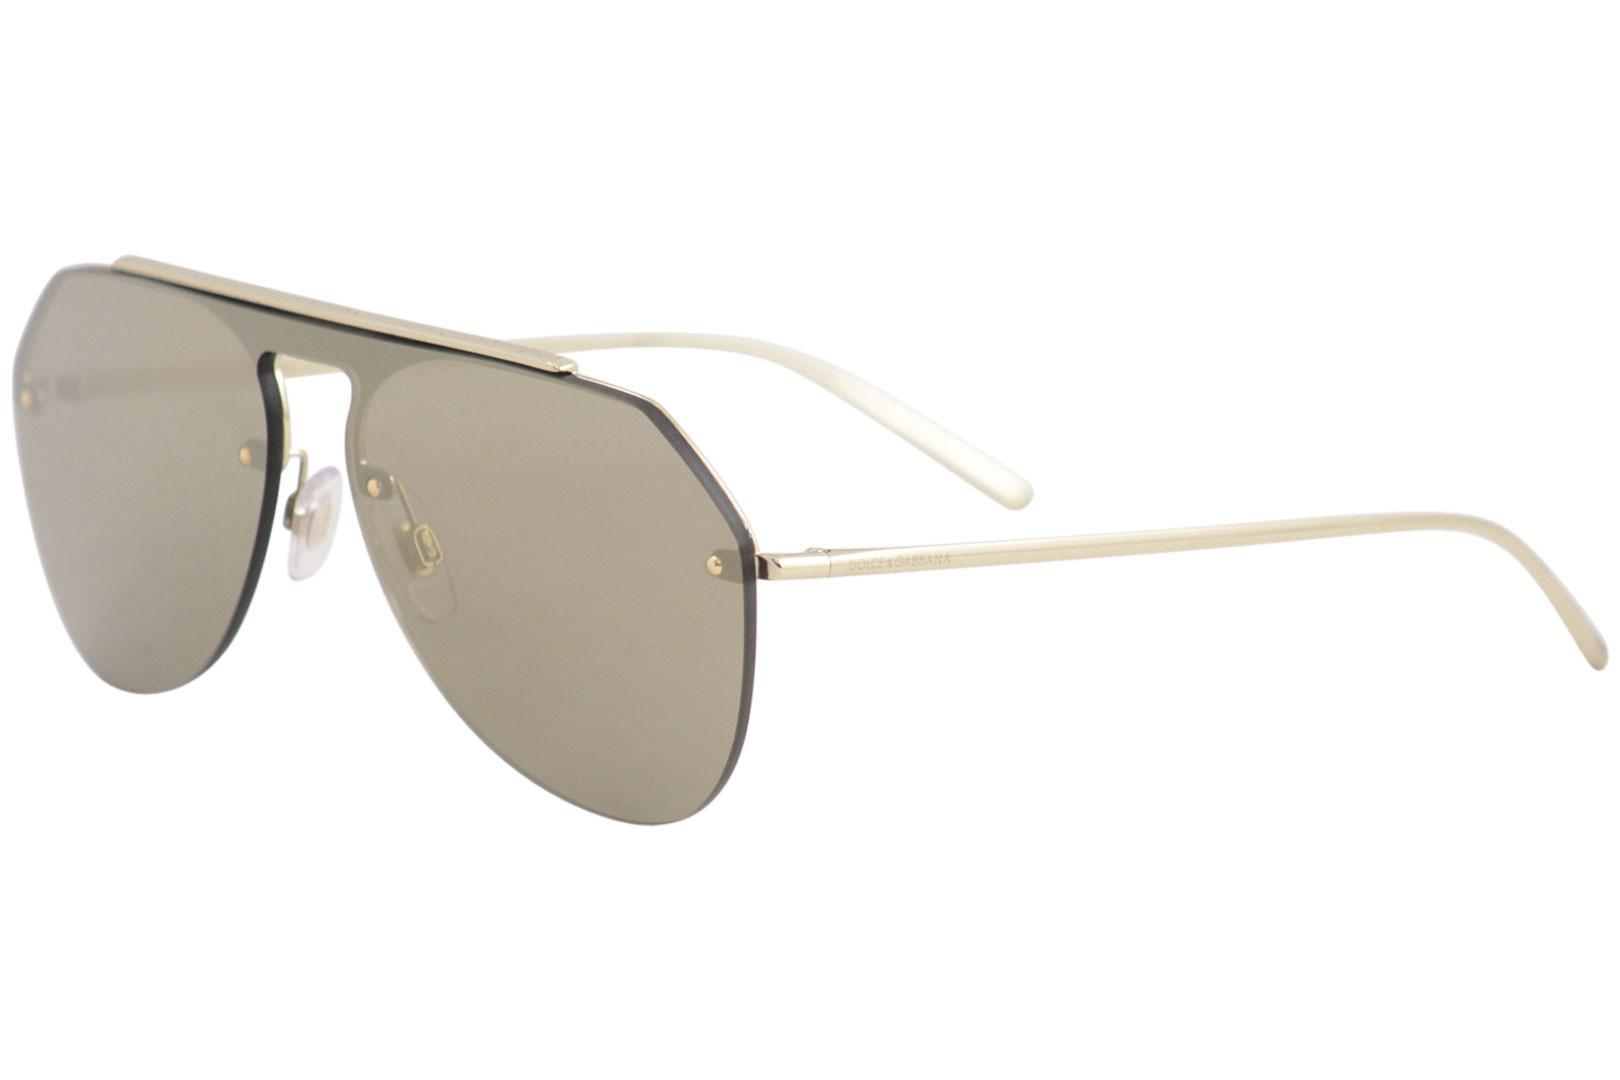 7db0a73ca7b9 Dolce   Gabbana Men s D G DG2213 DG 2213 Fashion Pilot Sunglasses by Dolce    Gabbana